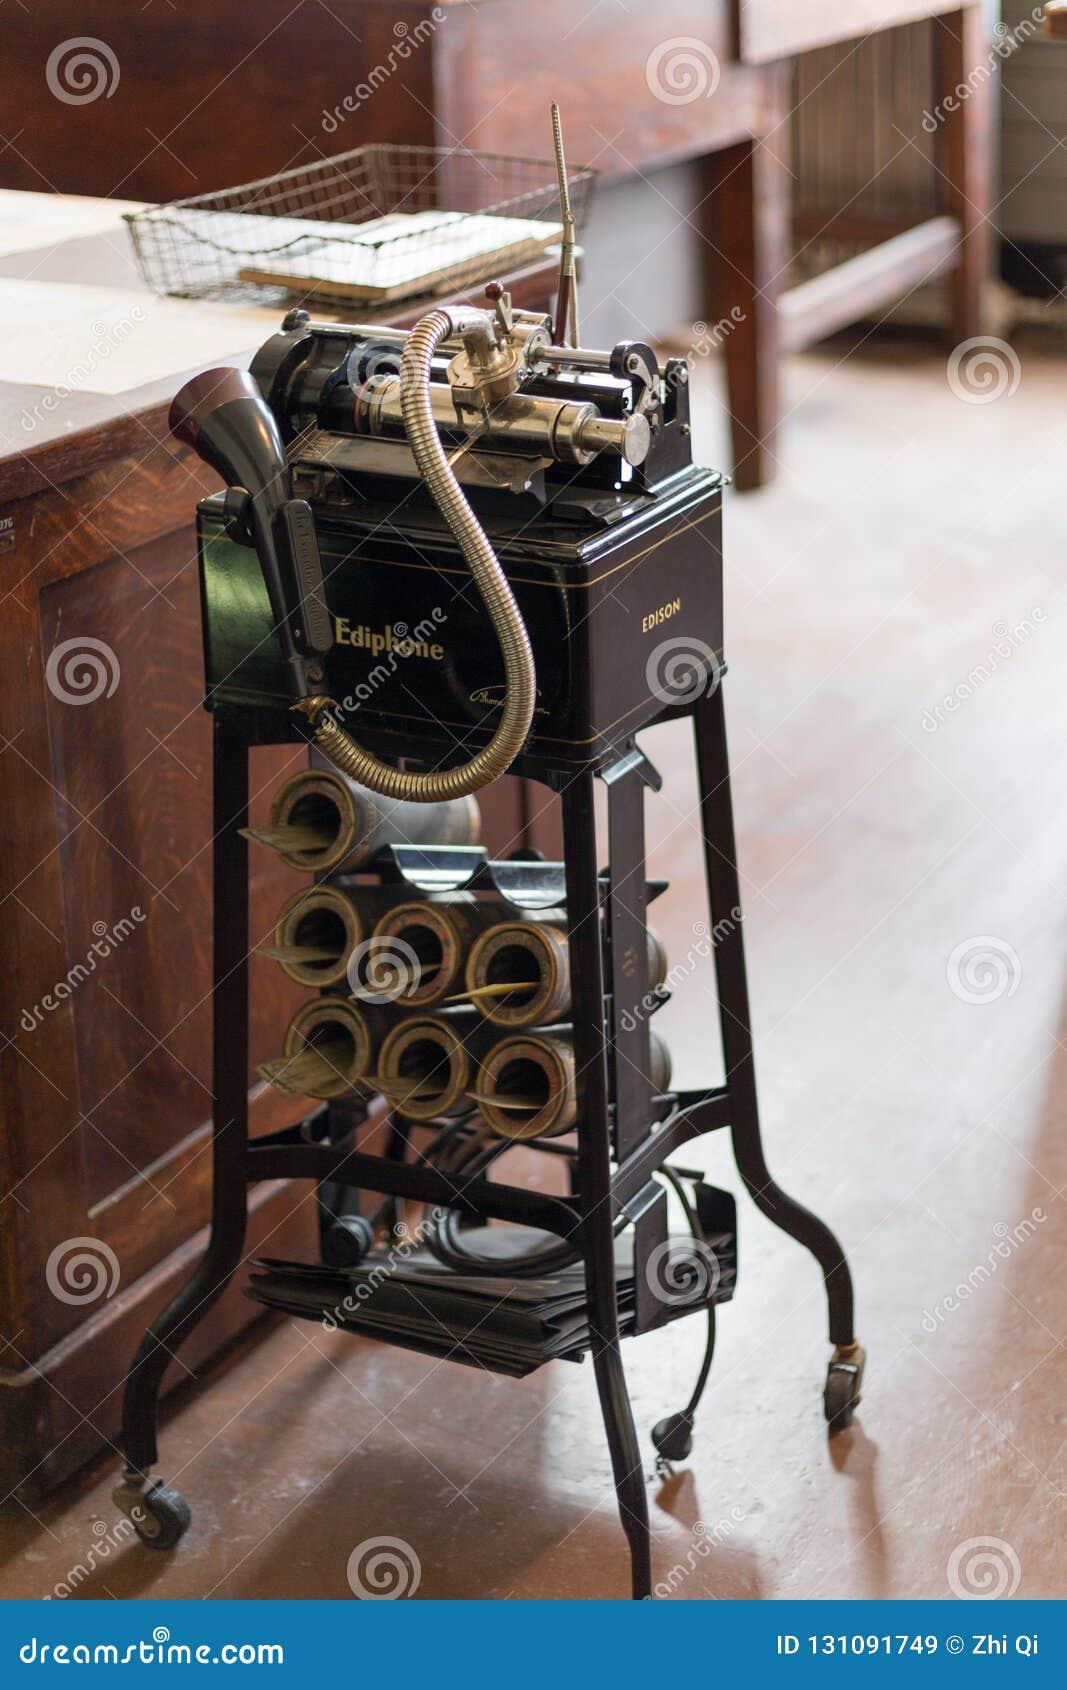 Thomas Edison National Historical Park preserva o laboratório de Thomas Edison